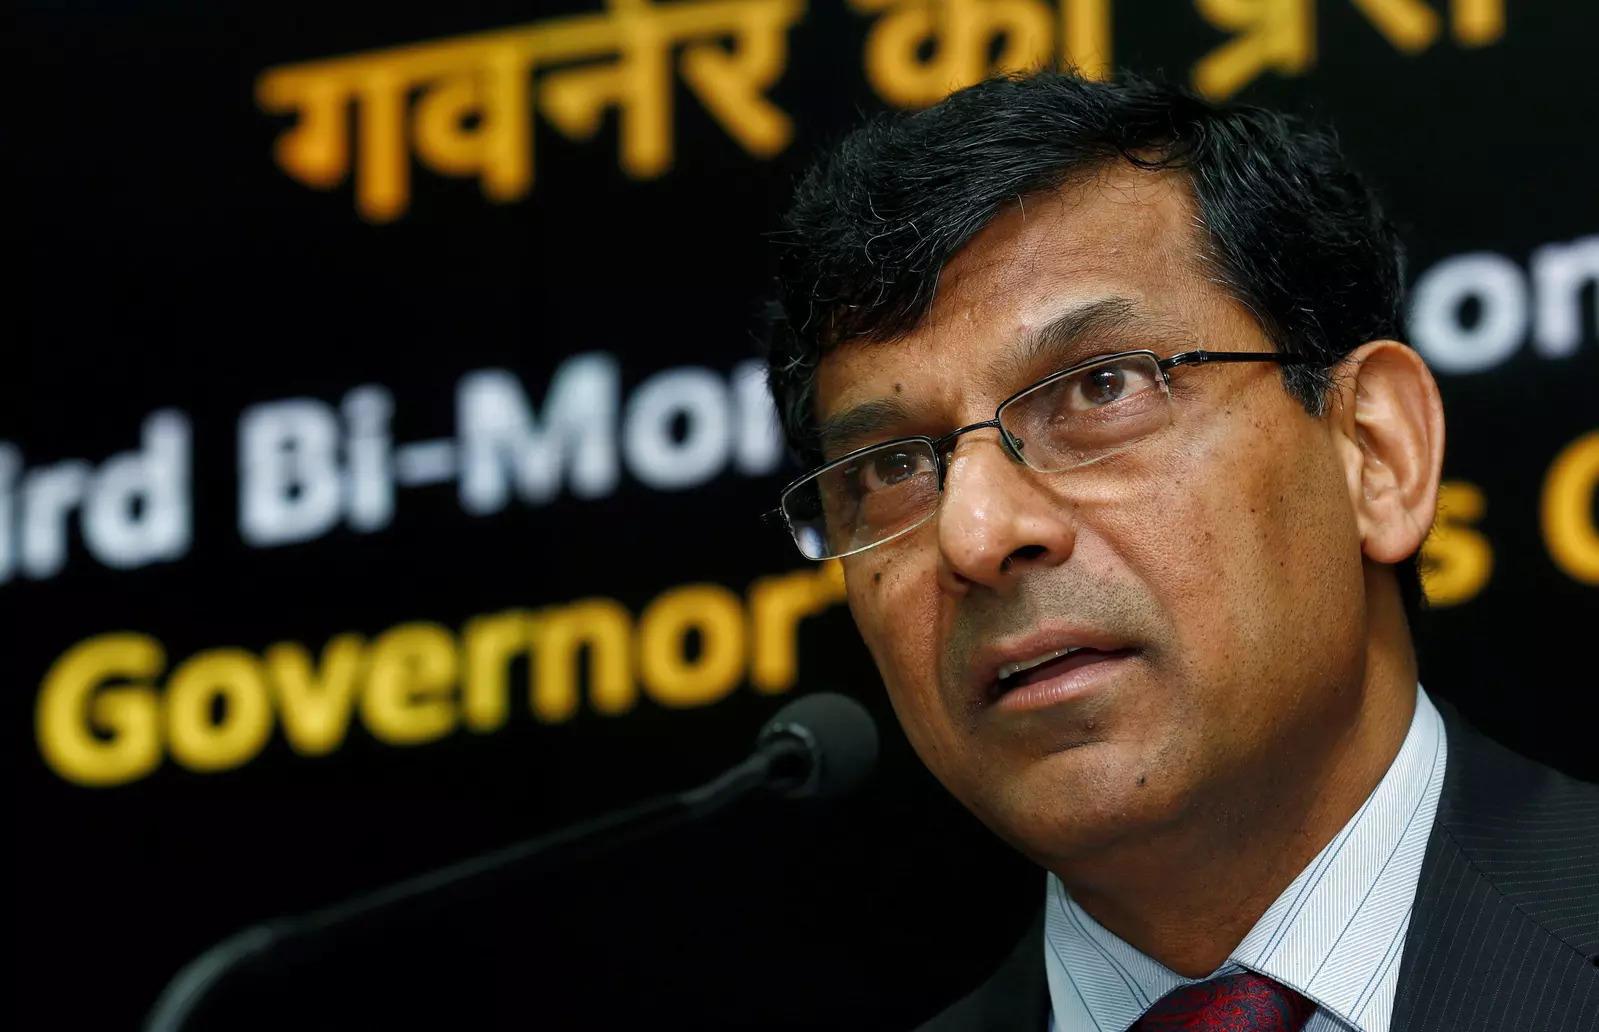 FILE PHOTO: Former Reserve Bank of India (RBI) Governor Raghuram Rajan speaks during a news conference